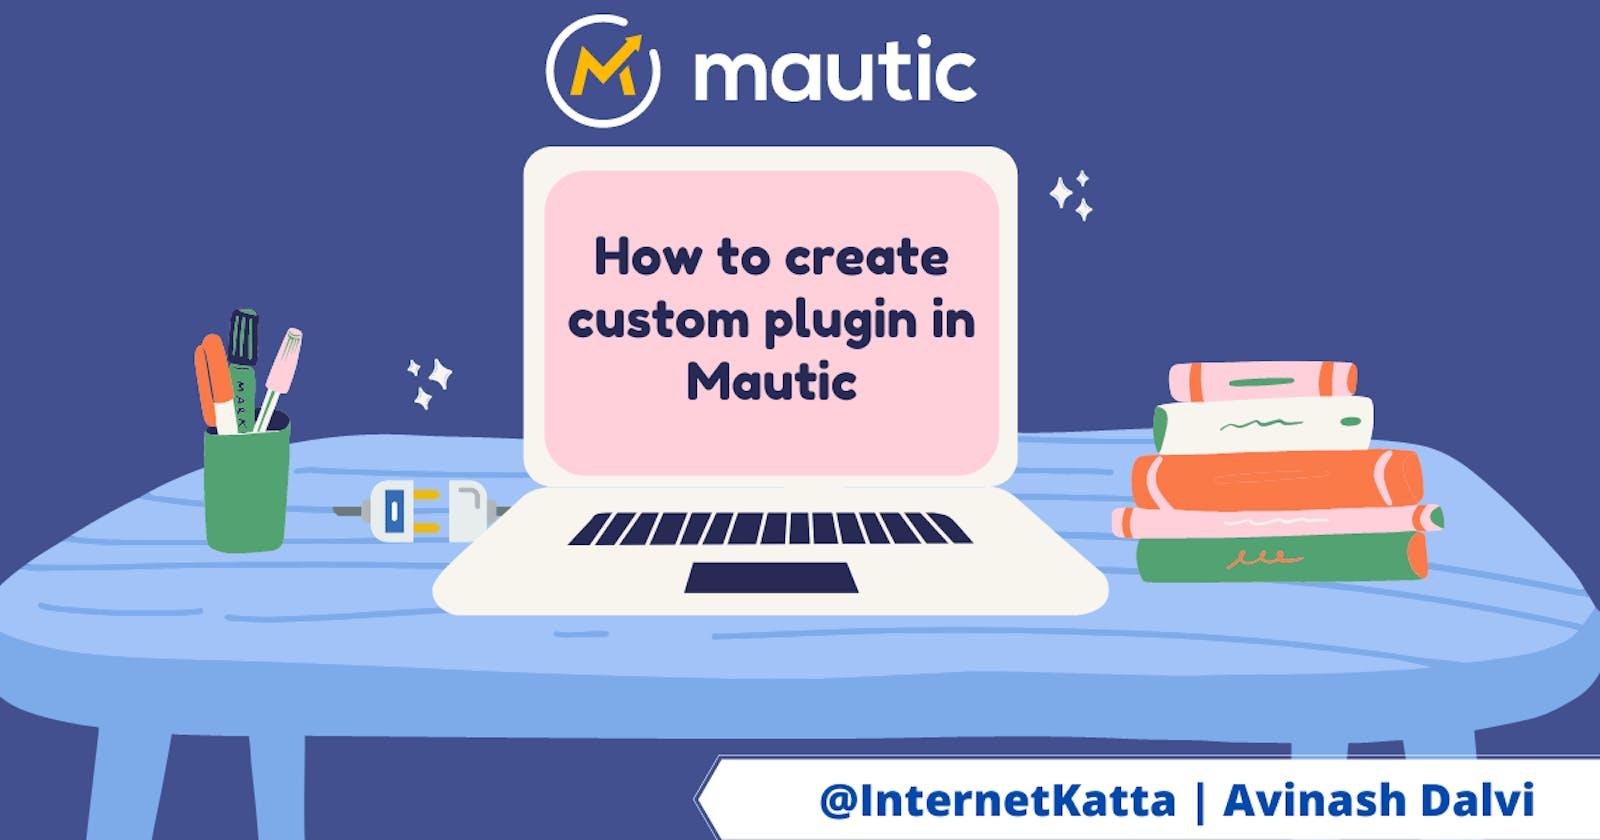 How to create custom plugin in Mautic